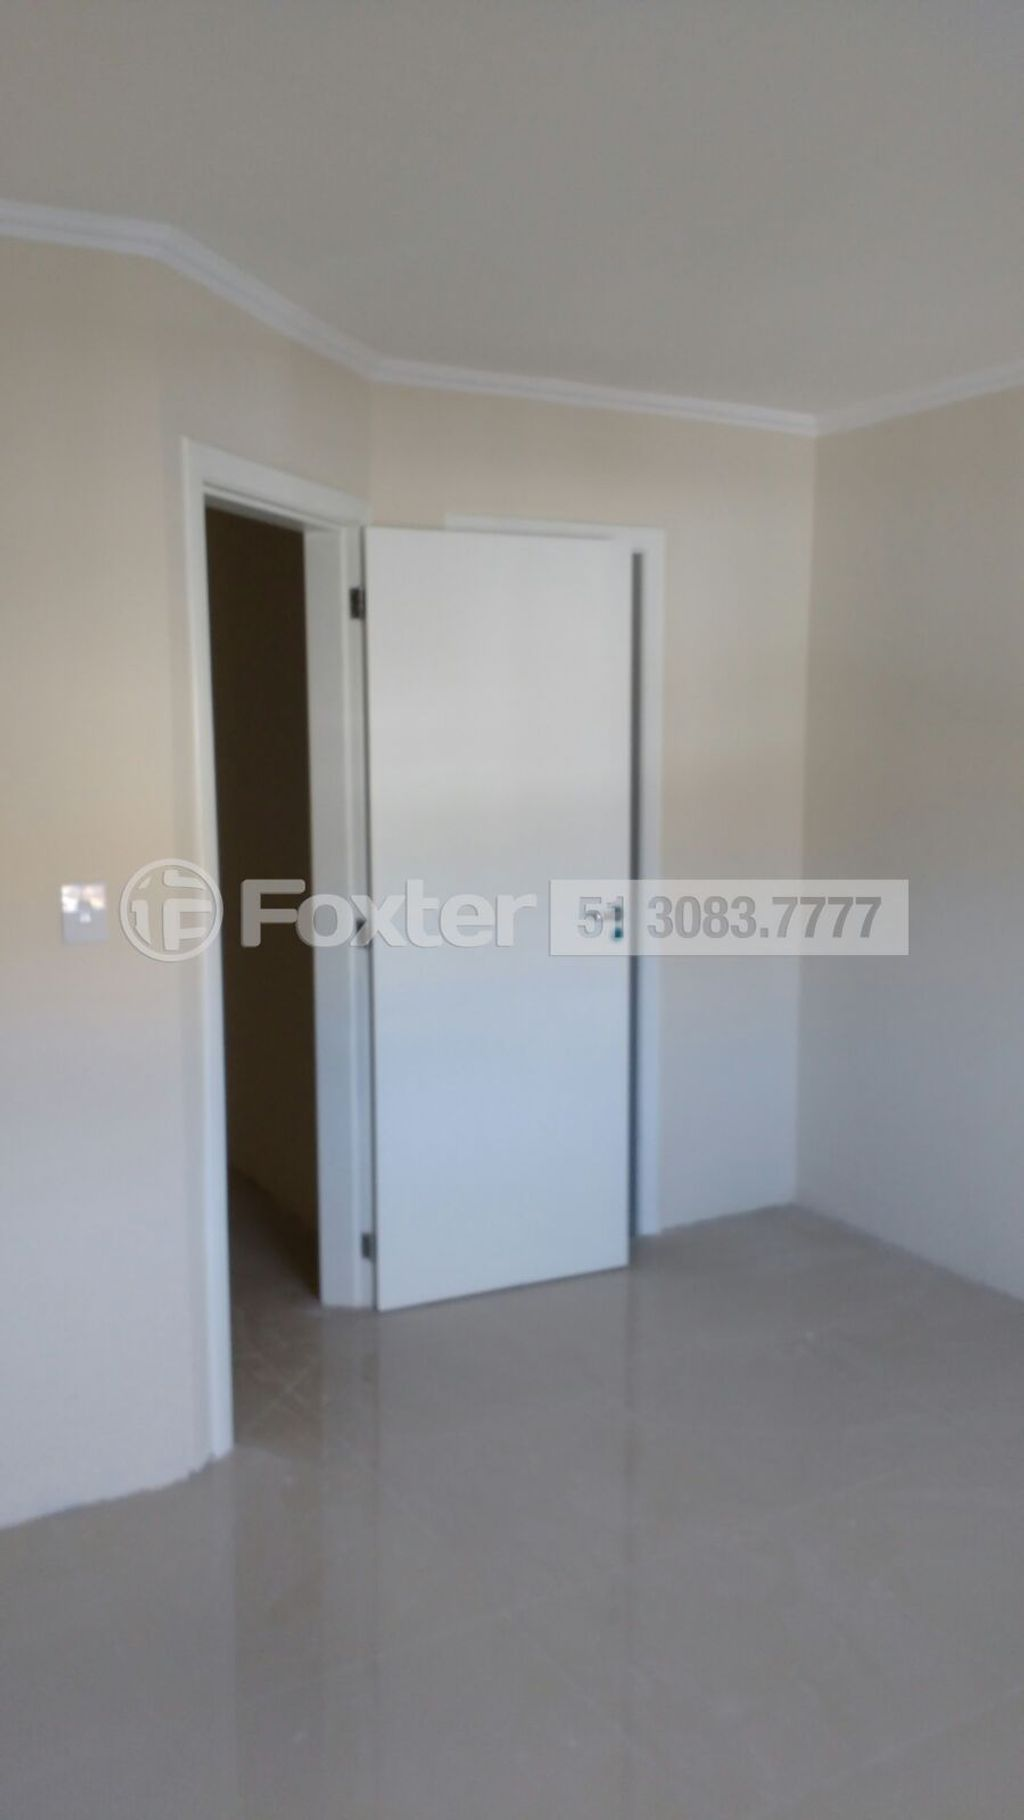 Casa 2 Dorm, Protásio Alves, Porto Alegre (136592) - Foto 5